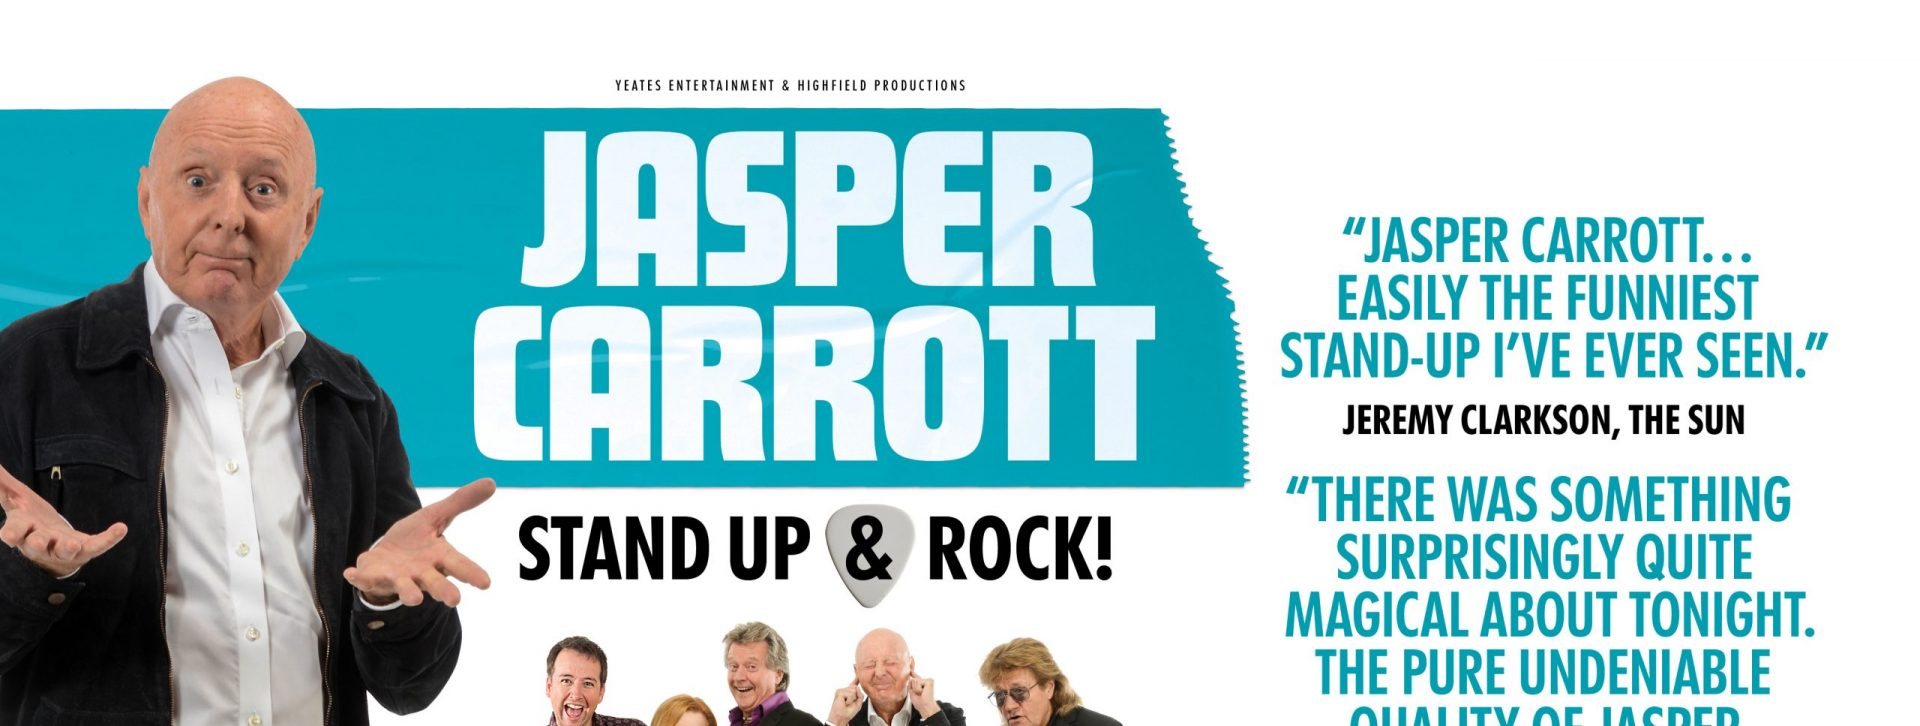 Jasper Carrott's Stand Up & Rock